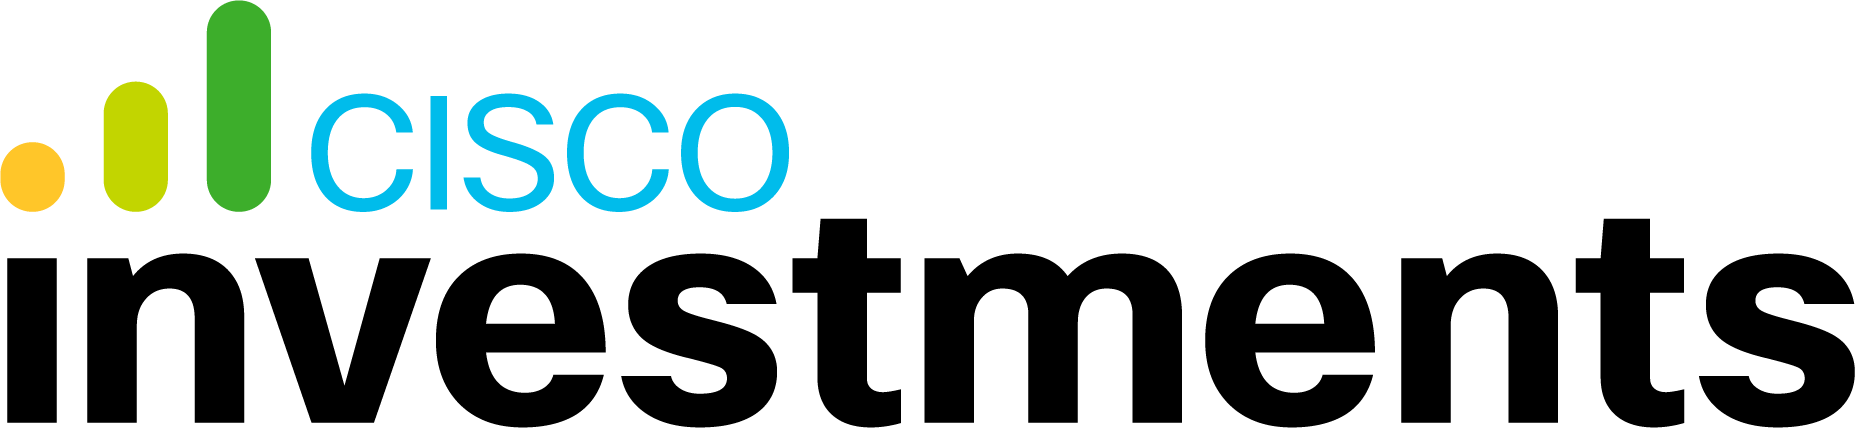 cisco_investments_event_3_logo